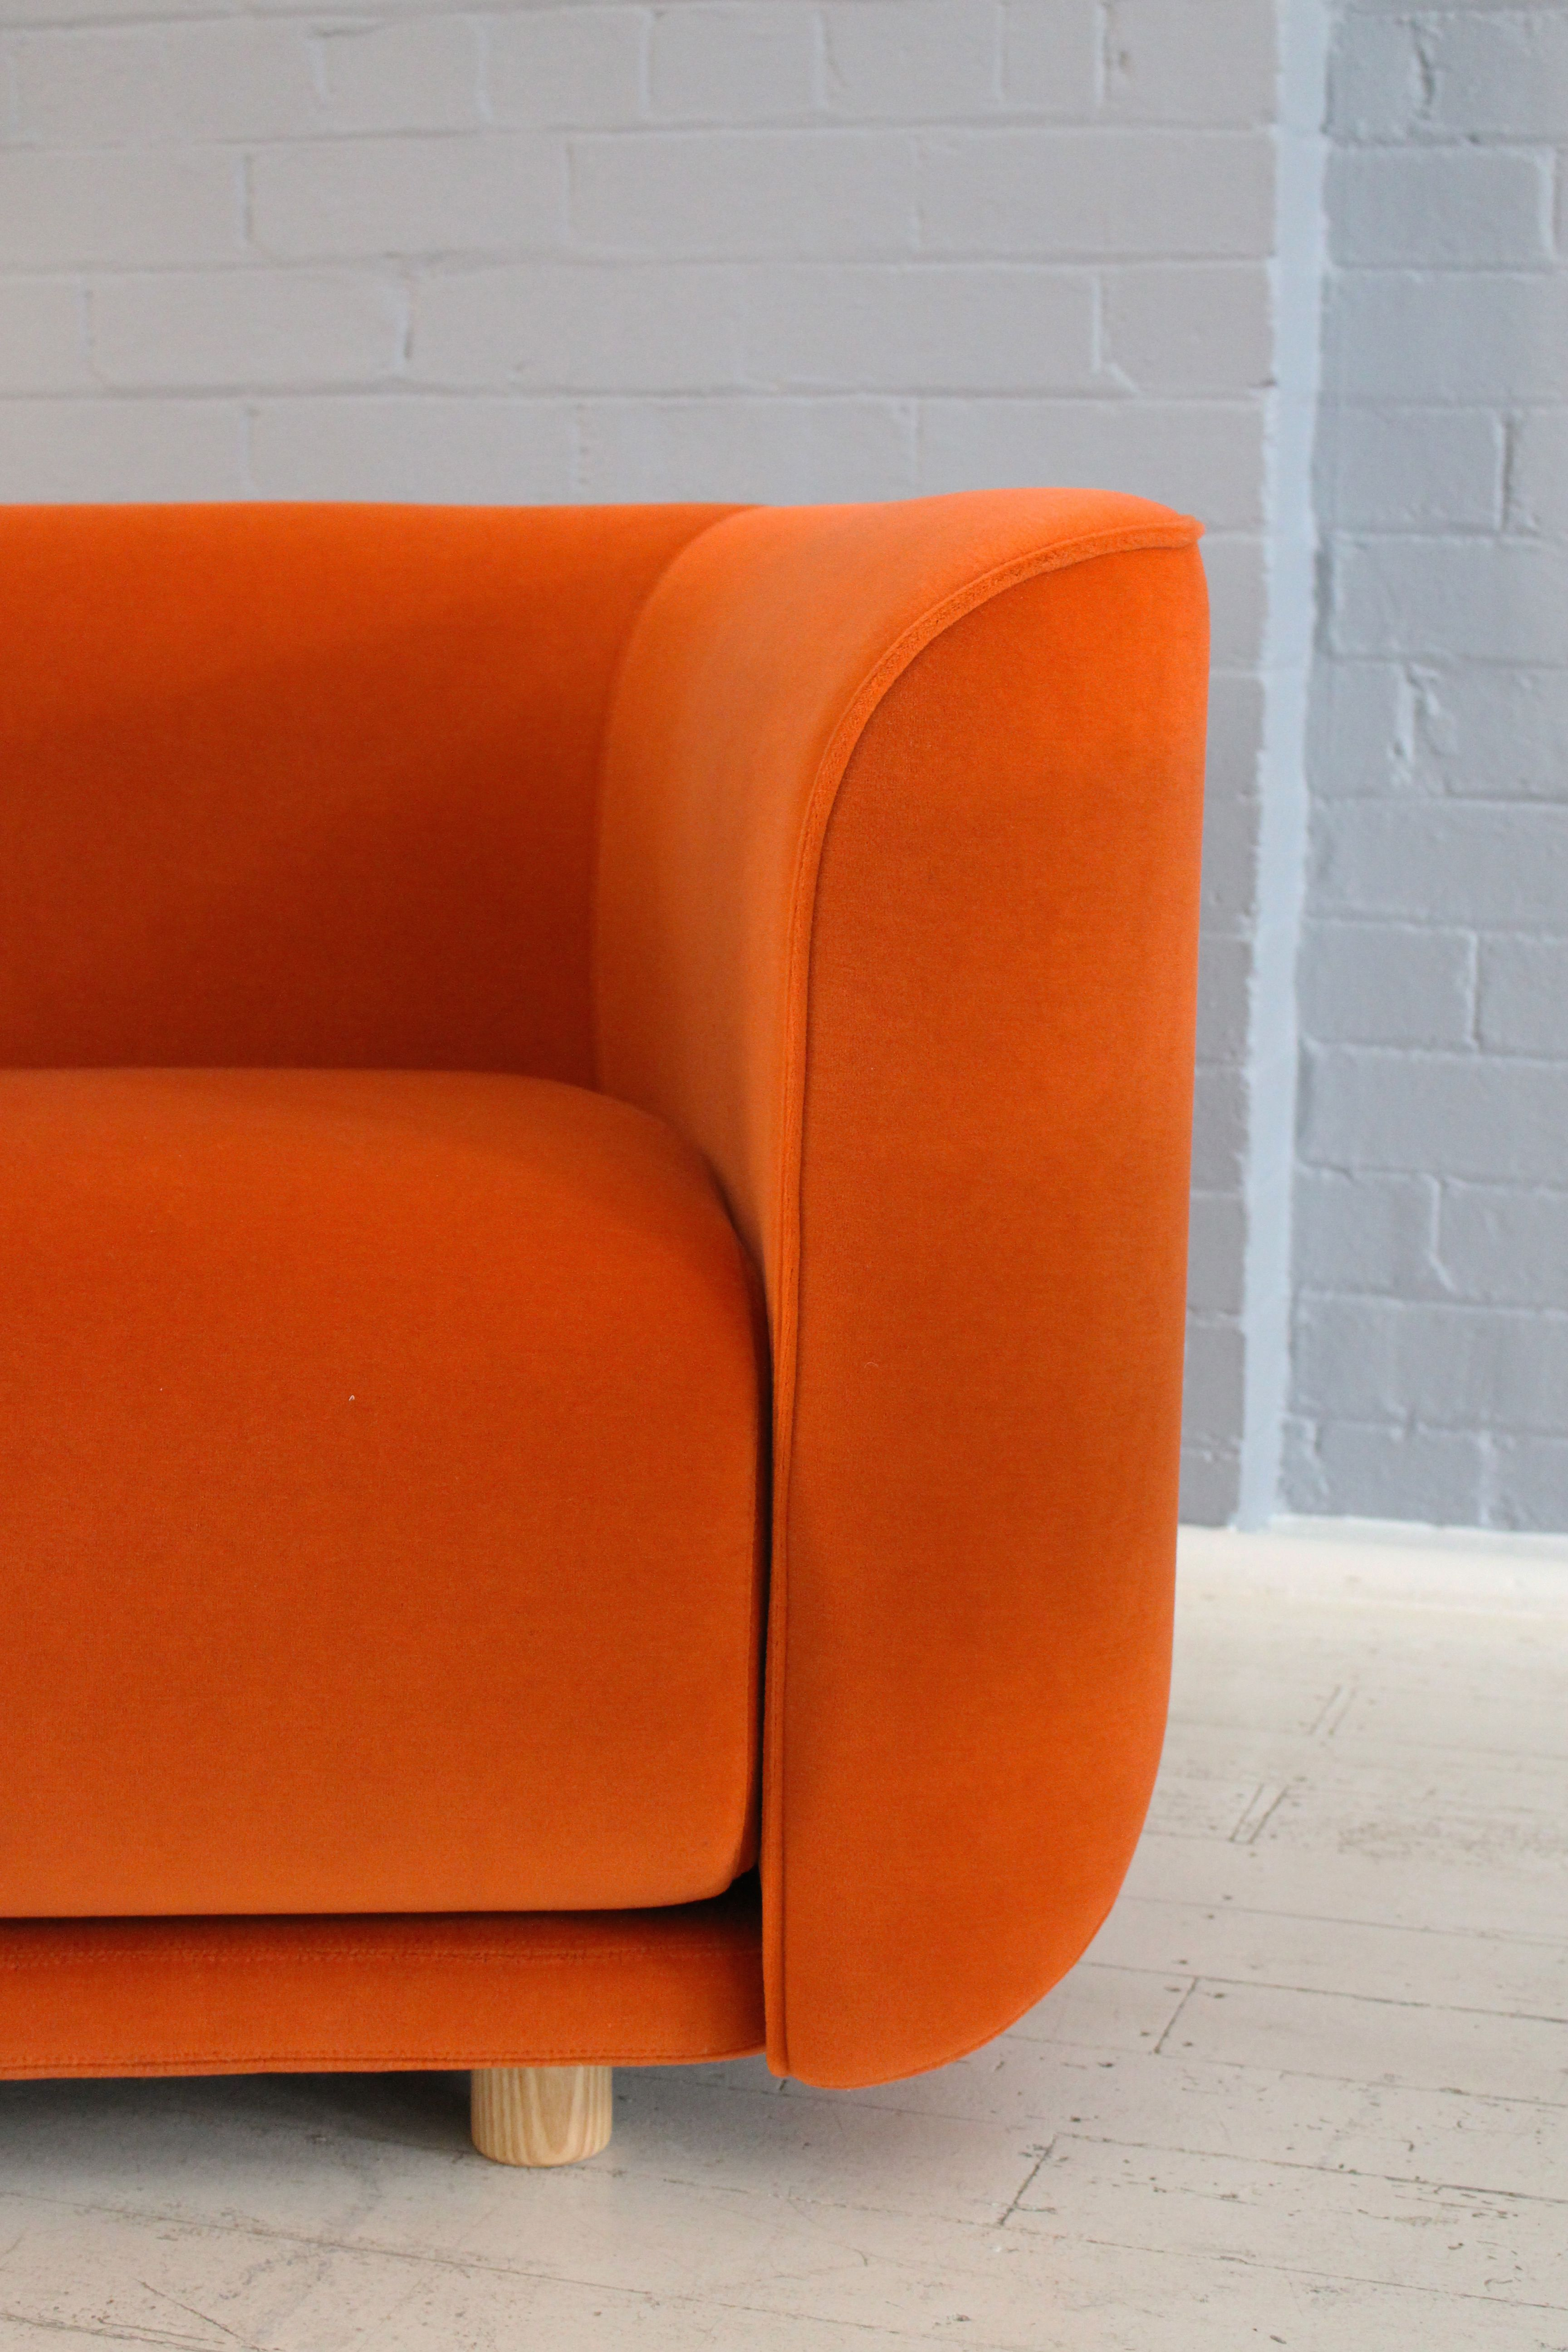 AGxCult Close up of Fat Tulip chair designed by Adam Goodrum for